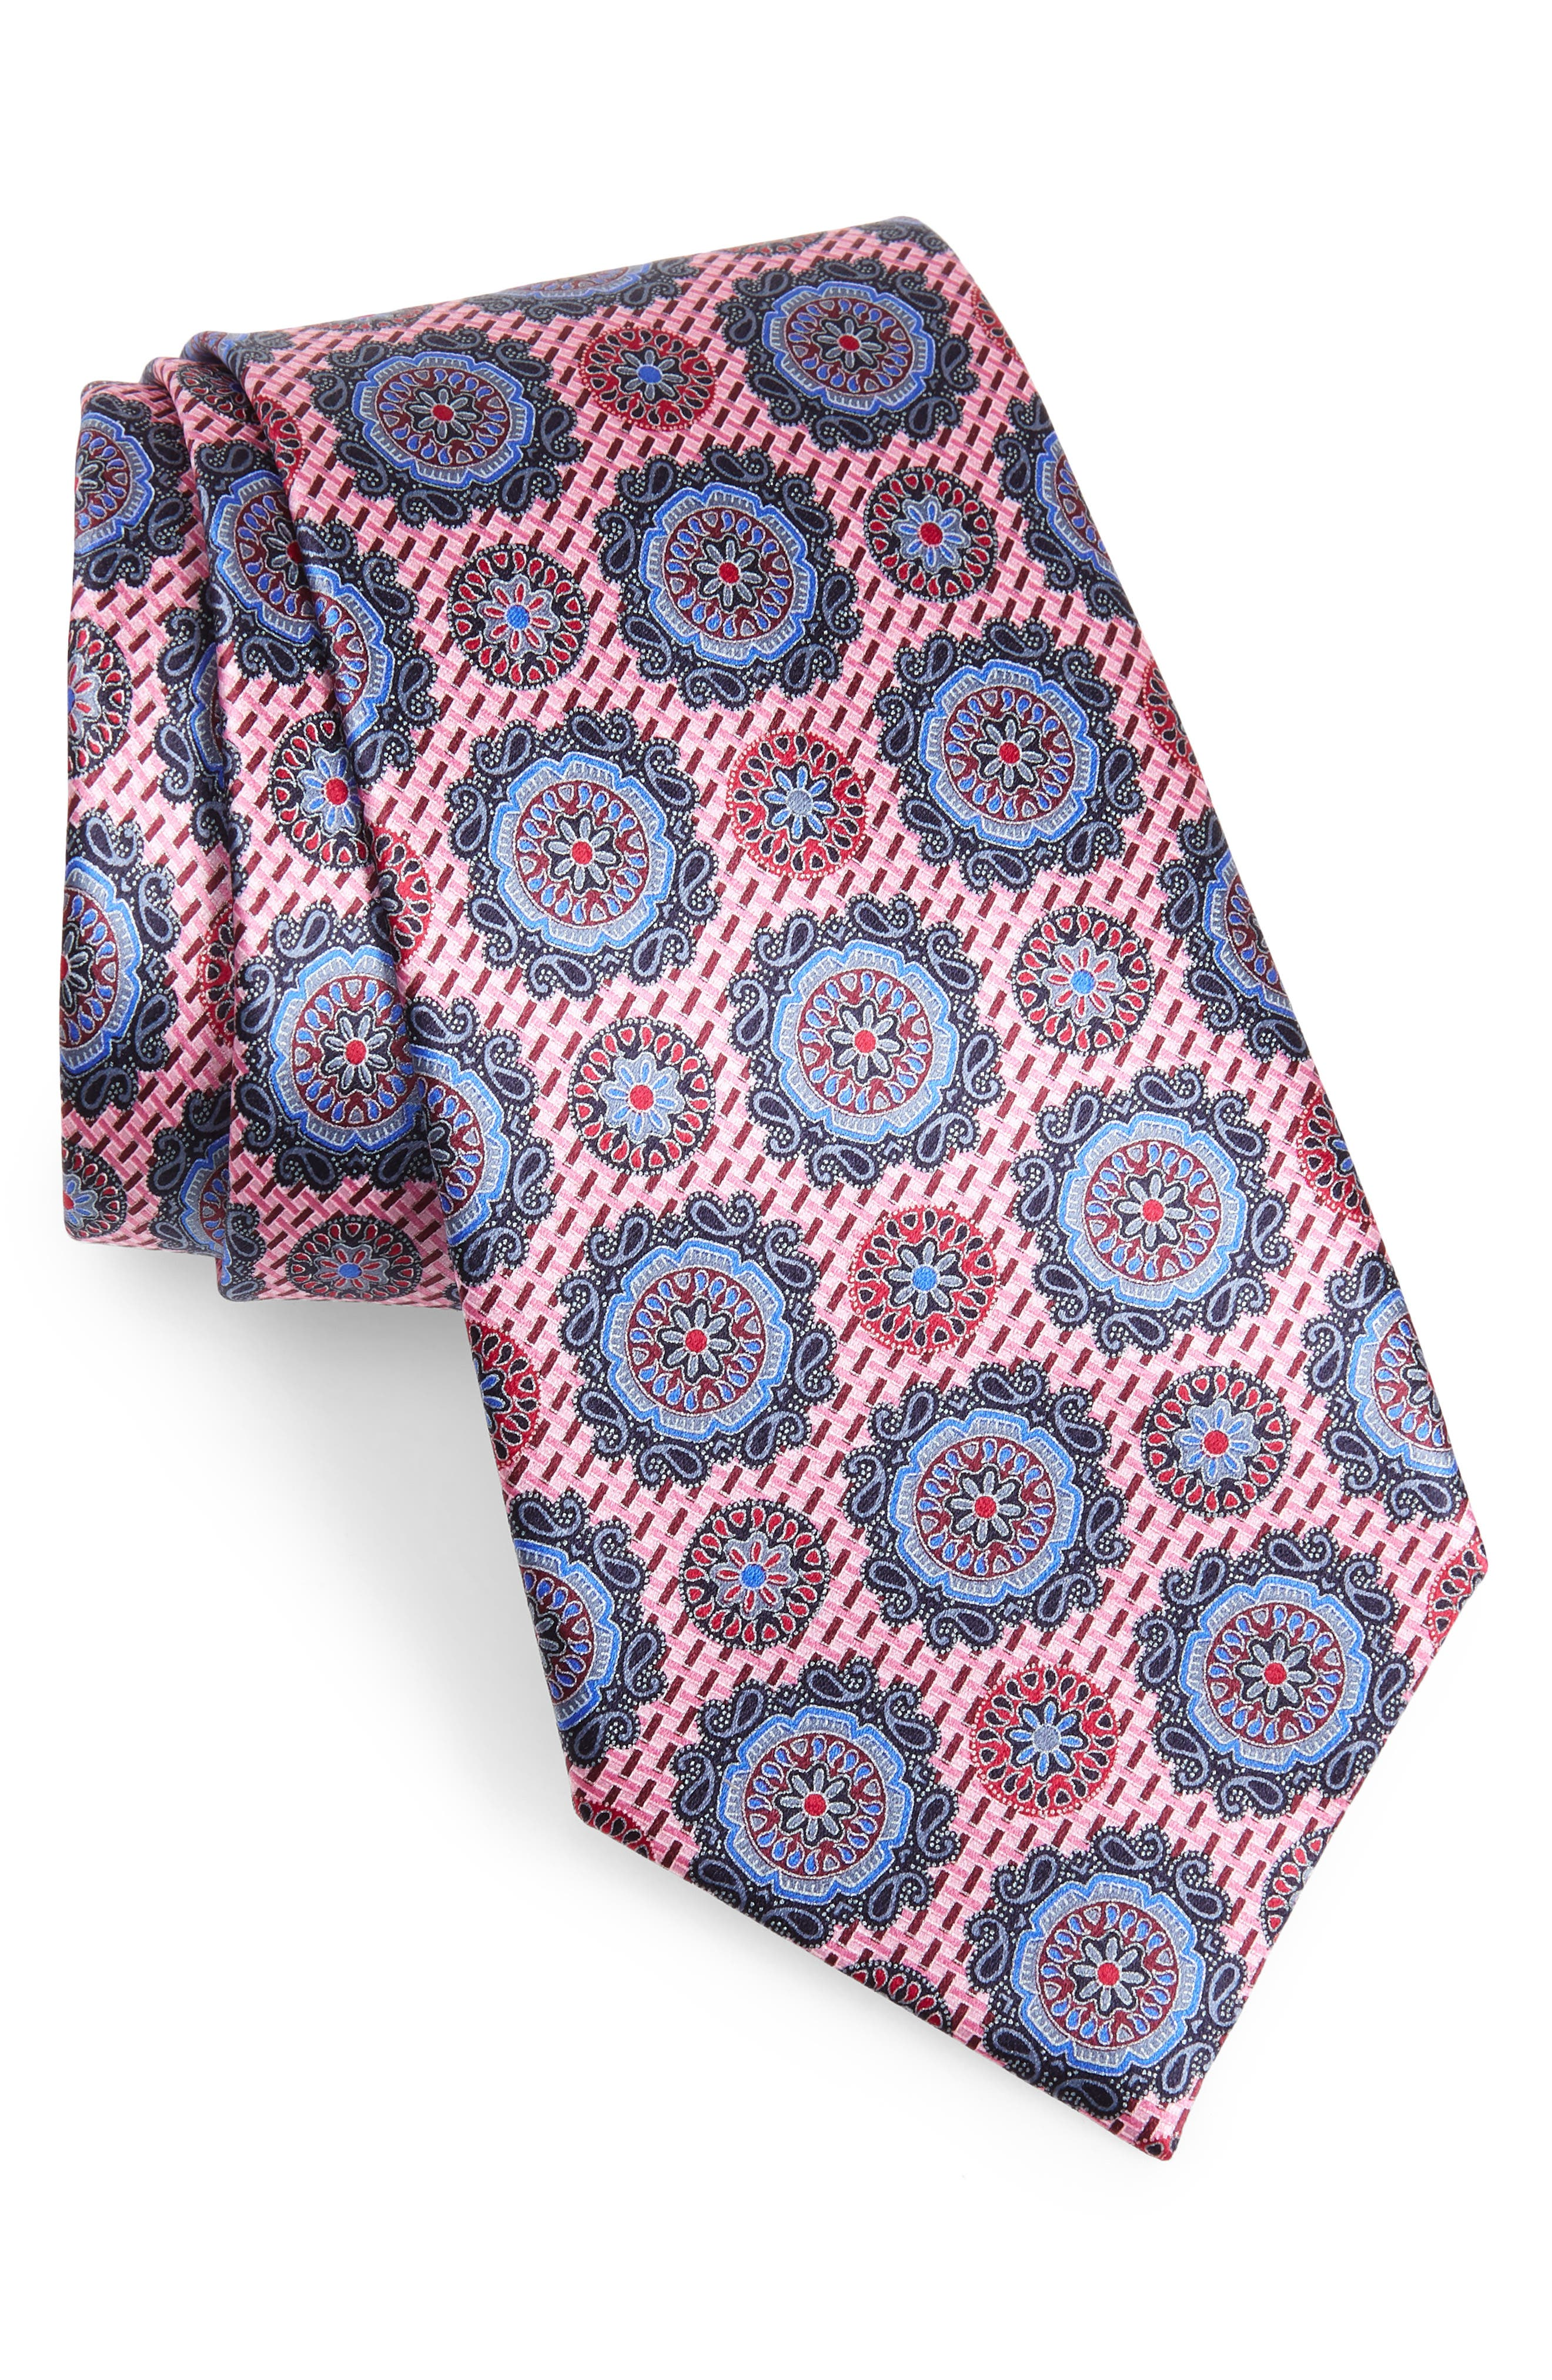 ERMENEGILDO ZEGNA Medallion Silk Tie, Main, color, PINK